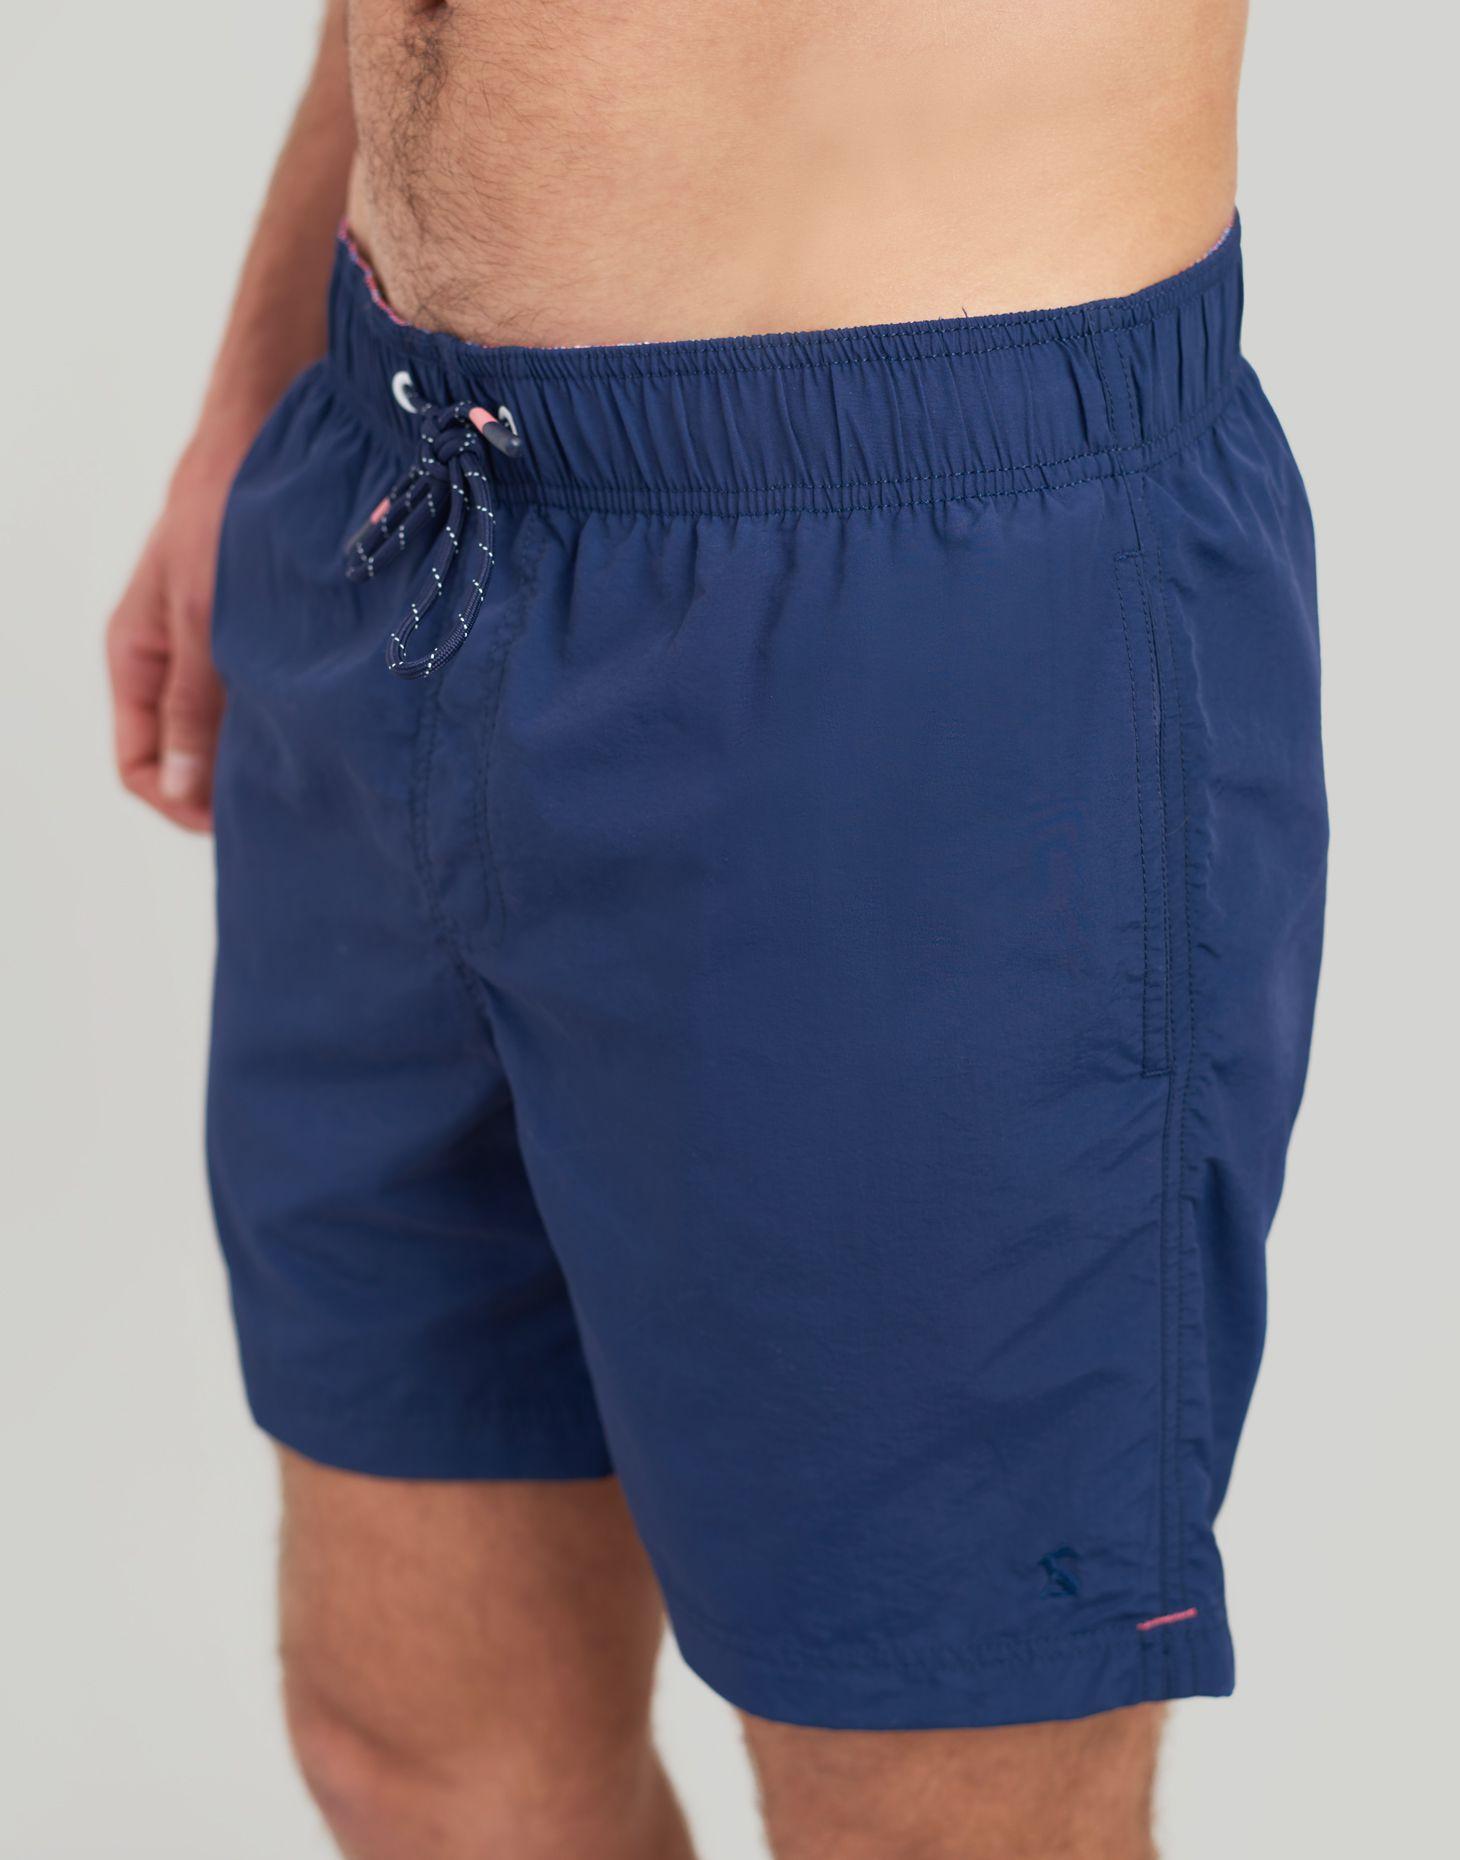 af58eb36ac Heston DARK BLUE Swim Shorts | Joules UK